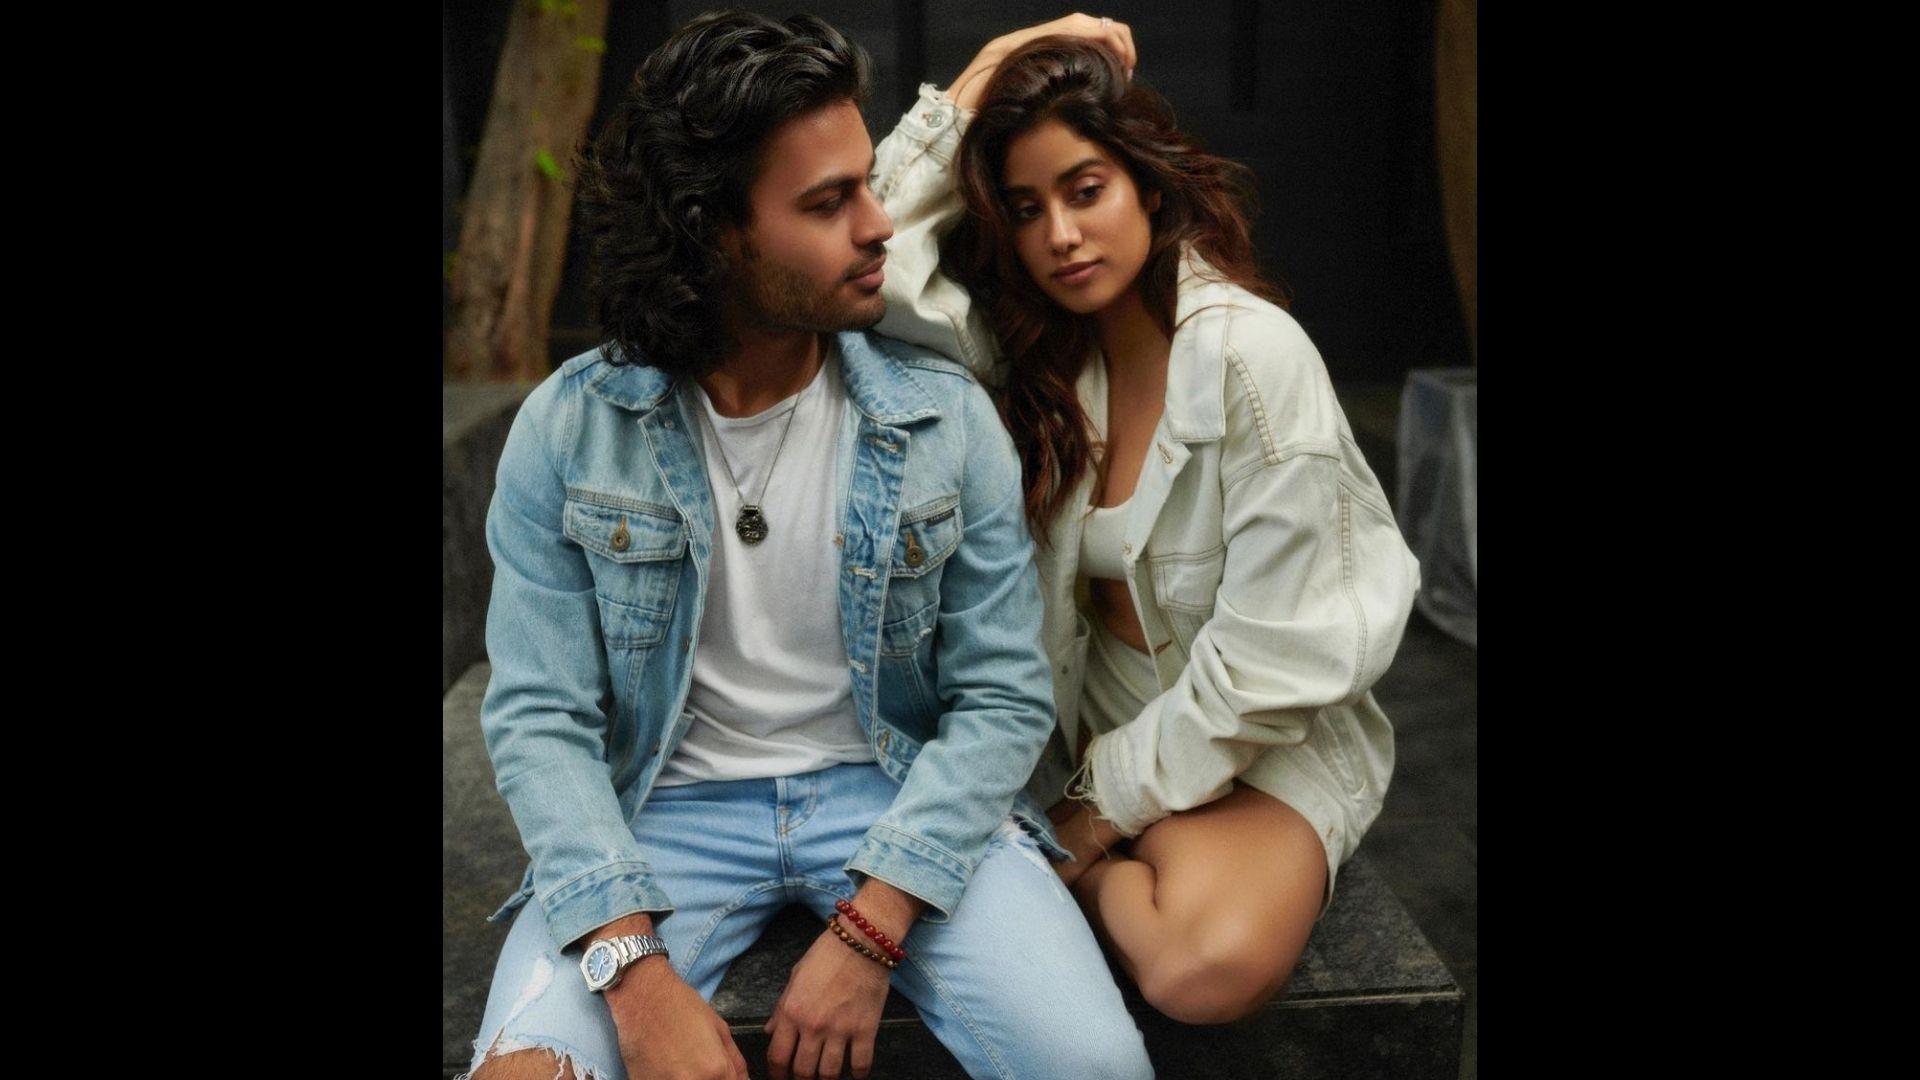 Is Janhvi Kapoor Getting Back With Her Ex-Boyfriend Akshat Rajan? Netizens Assume So